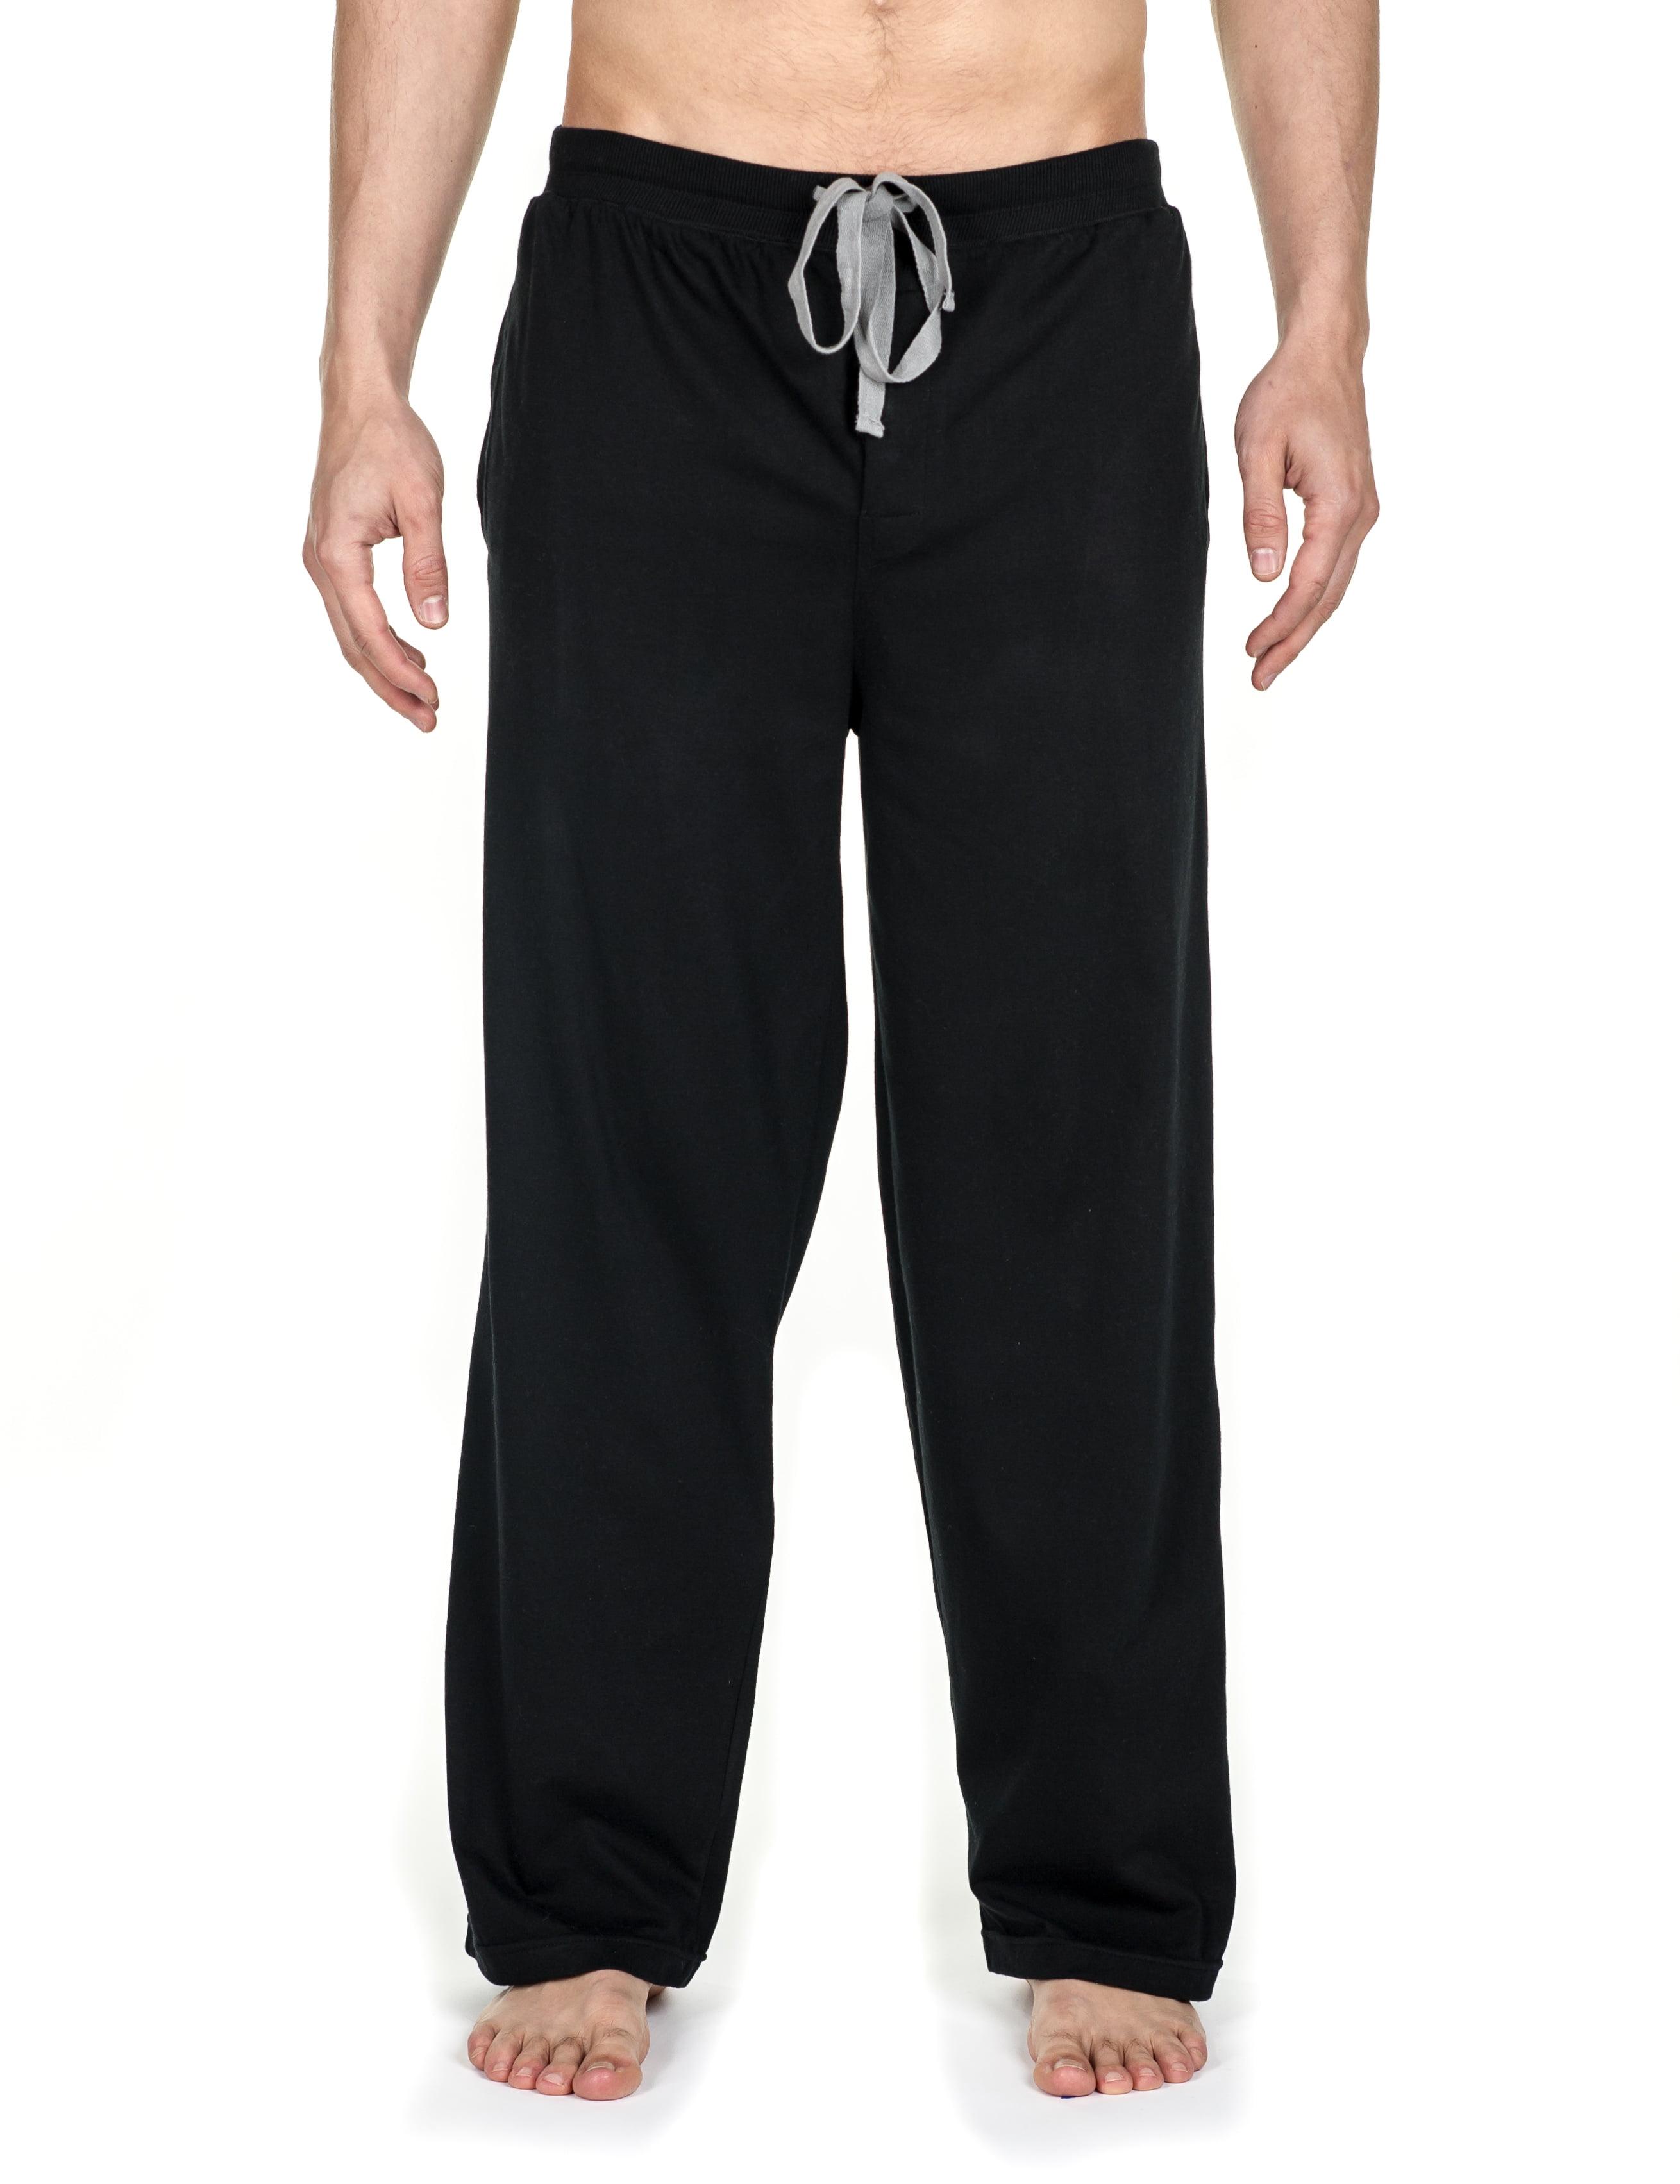 Twin Boat Mens Cotton Blend Knit Lounge/Sleep Pants